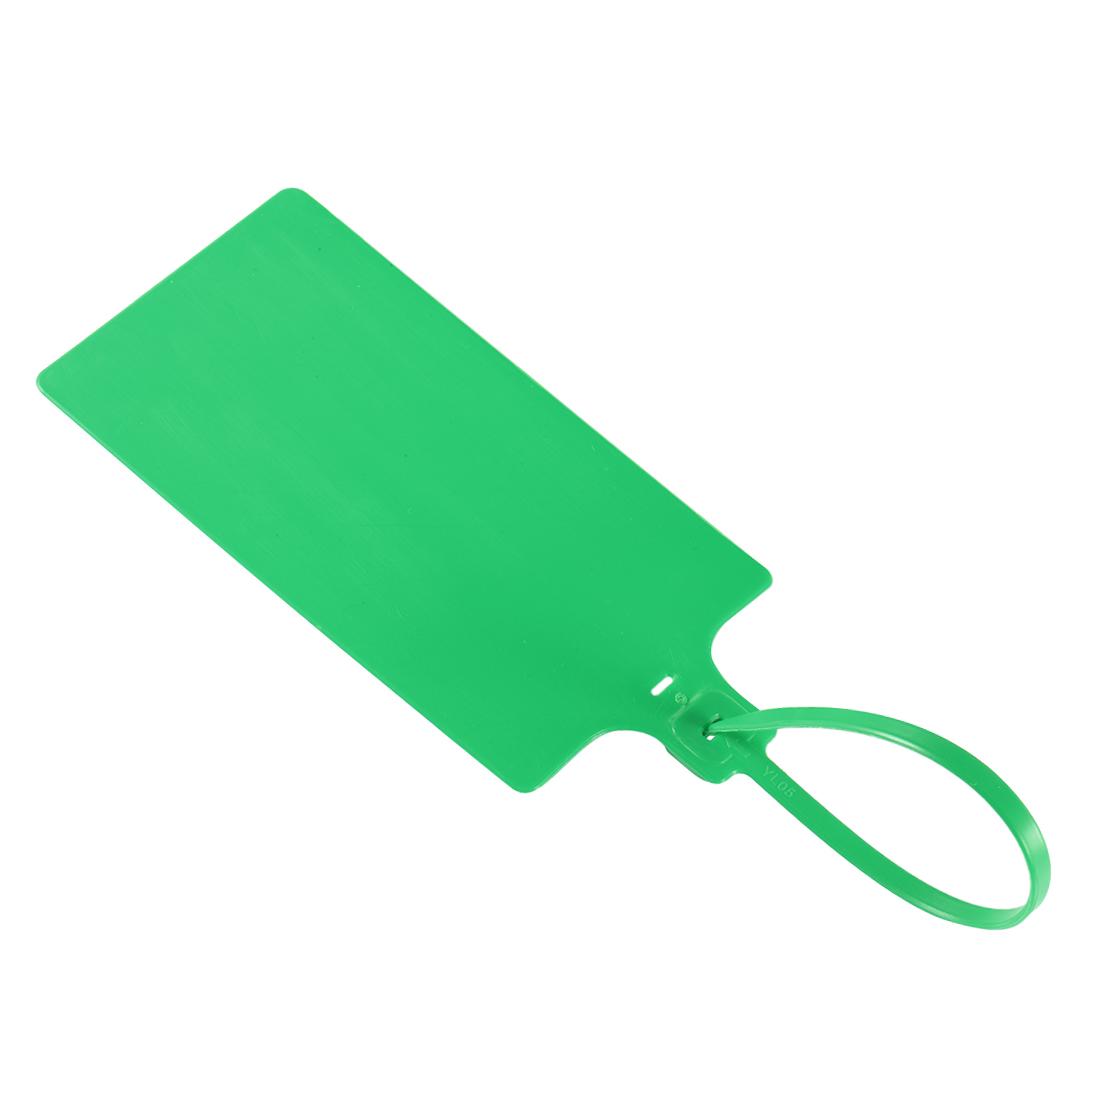 Plastic Zip Ties Seals Anti-Tamper 255mm Length, Green, Pack of 50